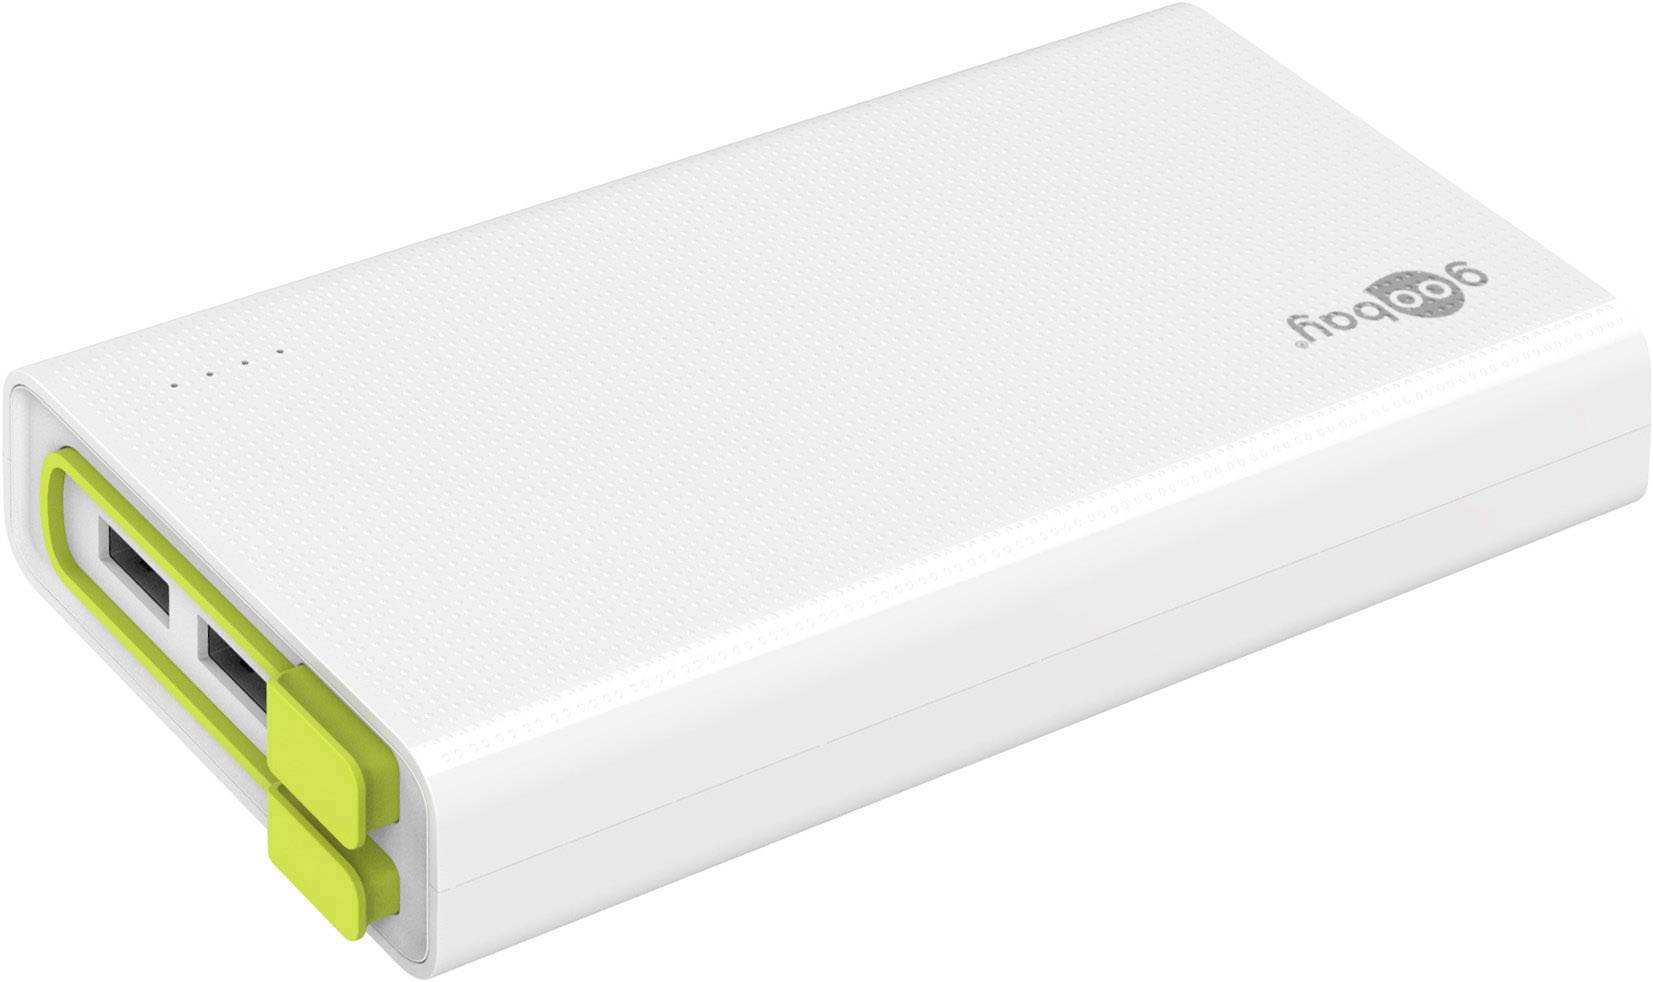 Powerbanka Goobay PowerBank 20.0, Li-Pol, 20000 mAh, bílá